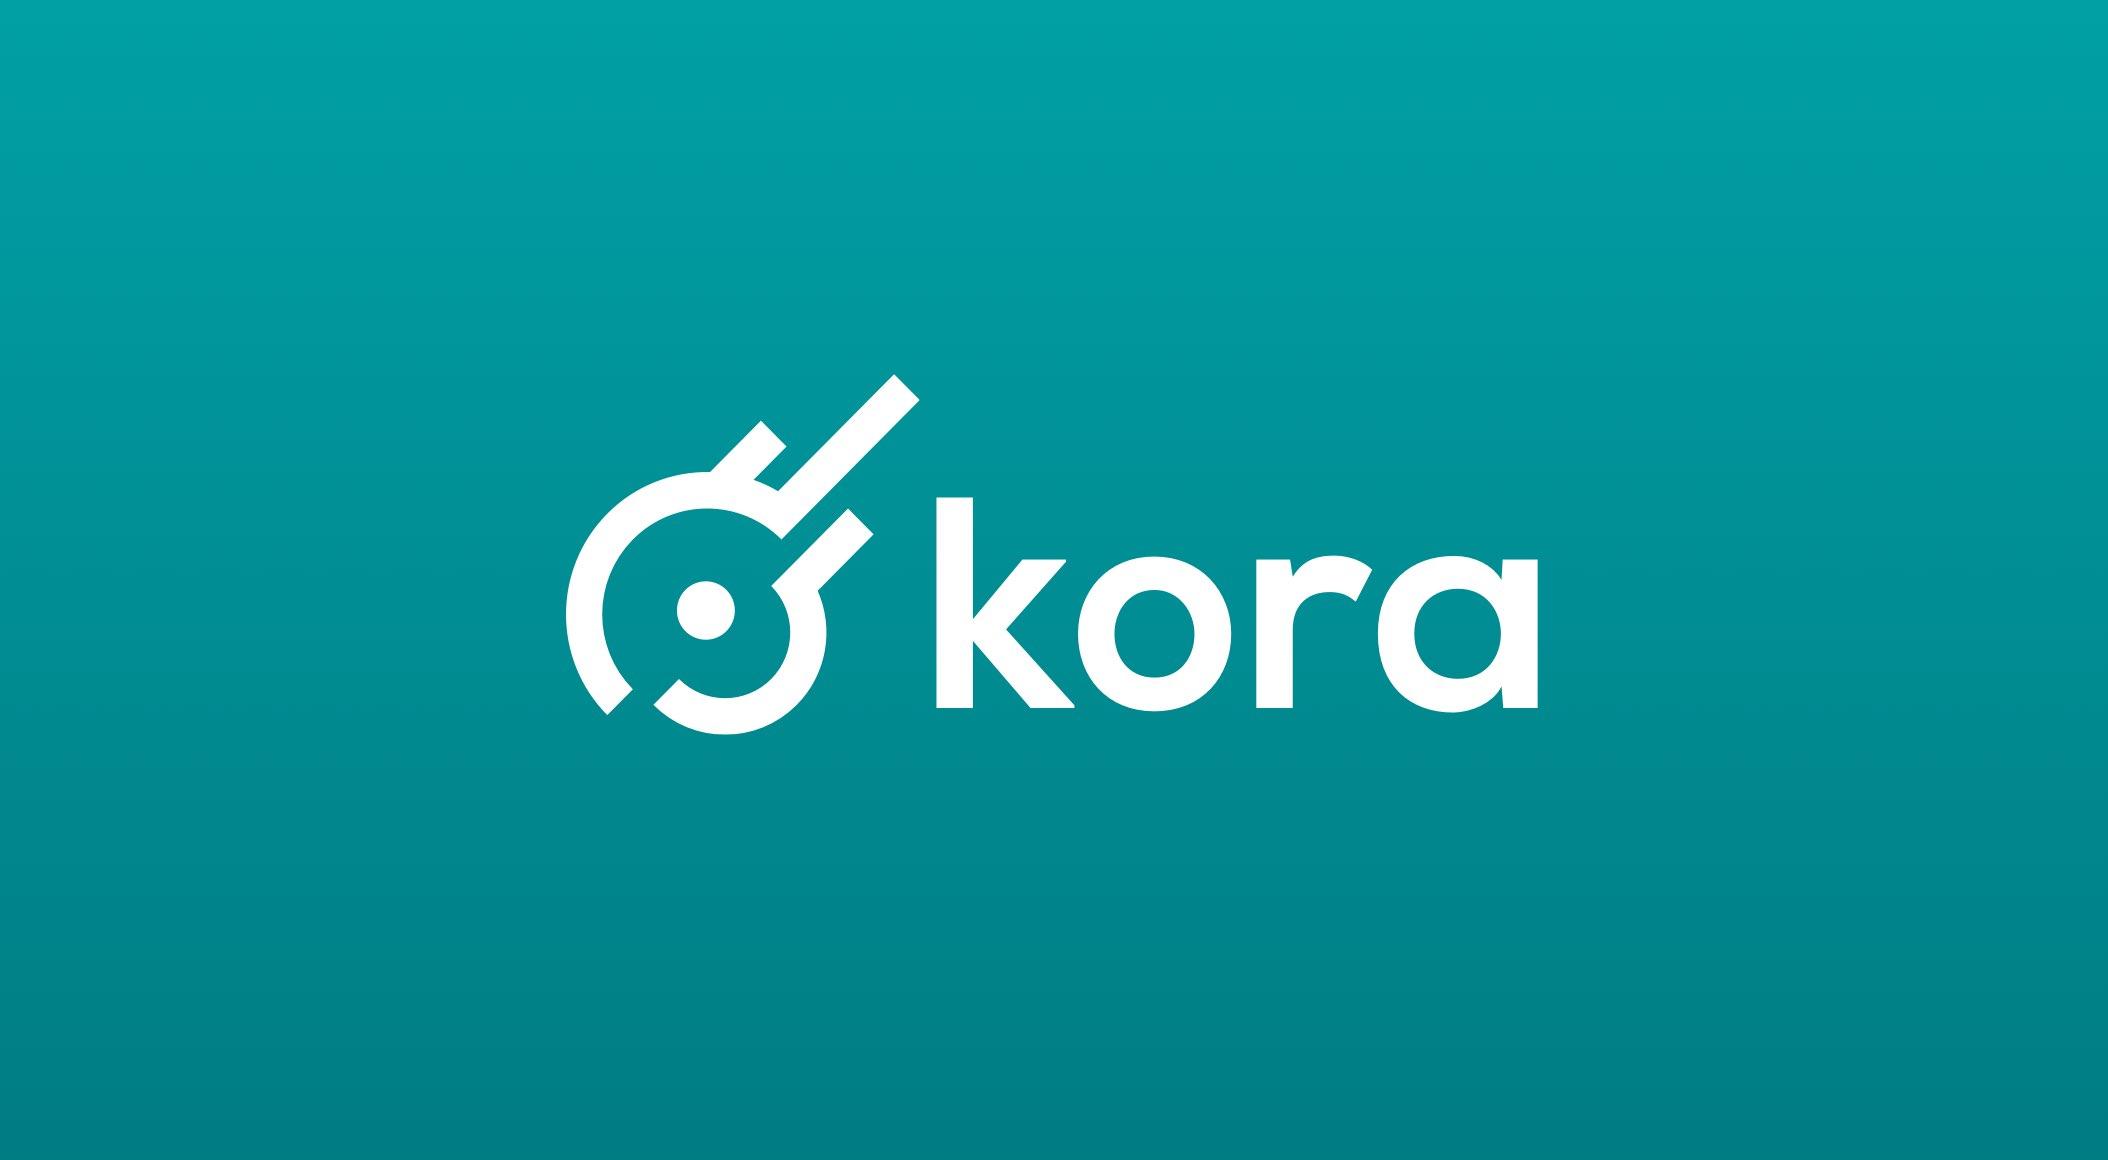 Kora Imagery